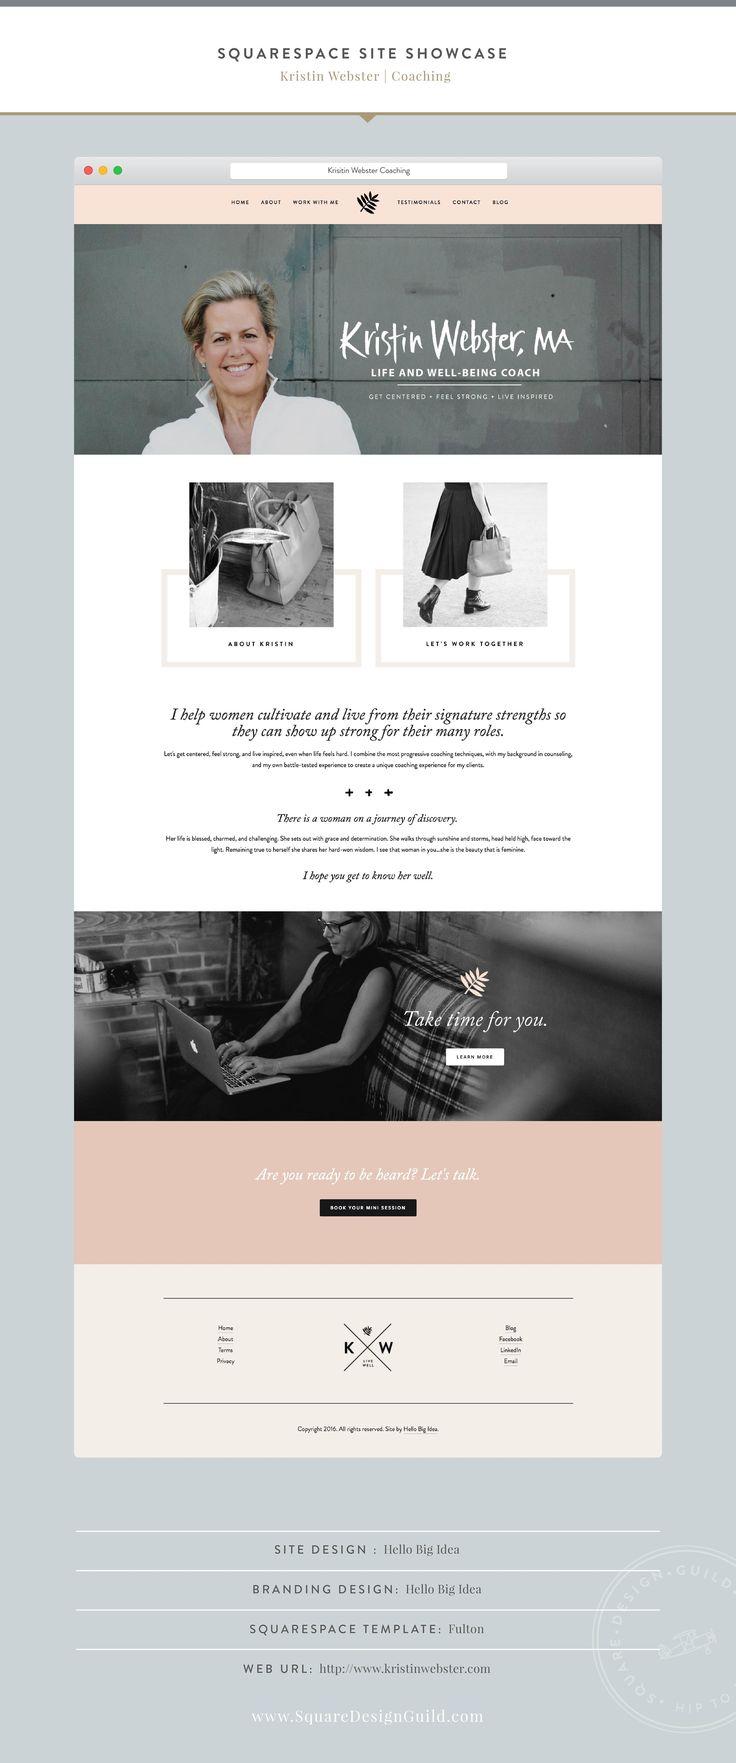 Squarespace Design Guild | Squarespace Site Showcase | Designed by Hello Big…